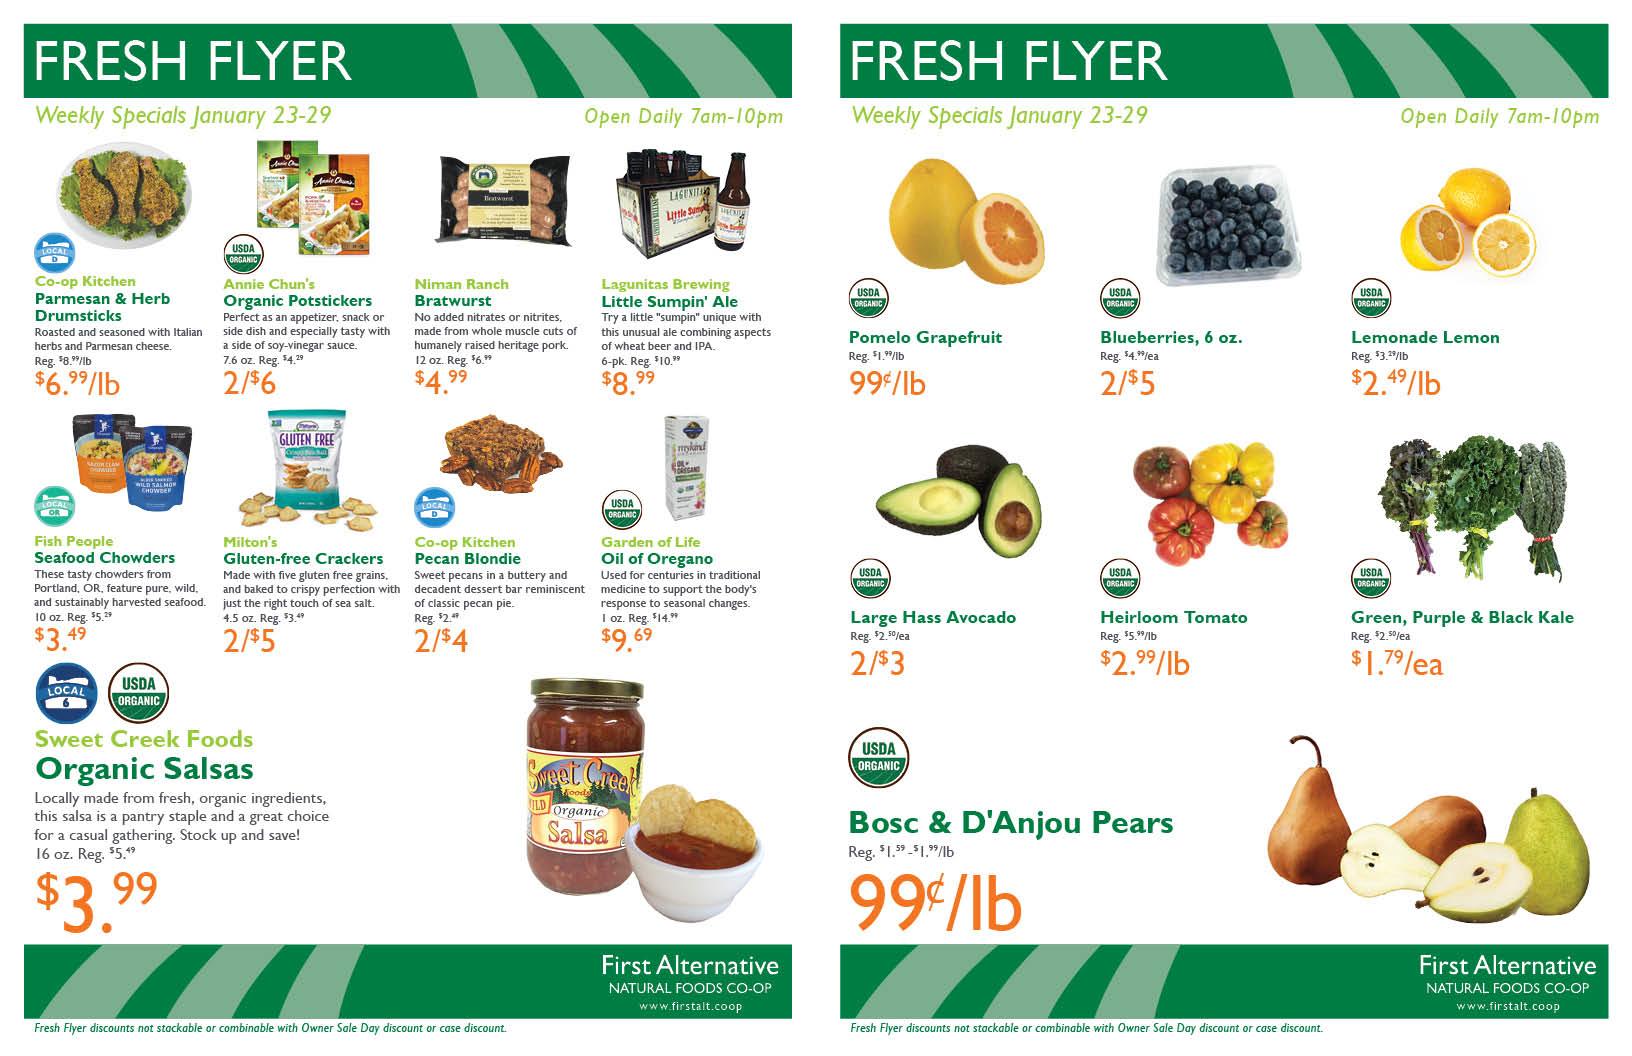 First Alternative Co-op Fresh Flyer January 23-29